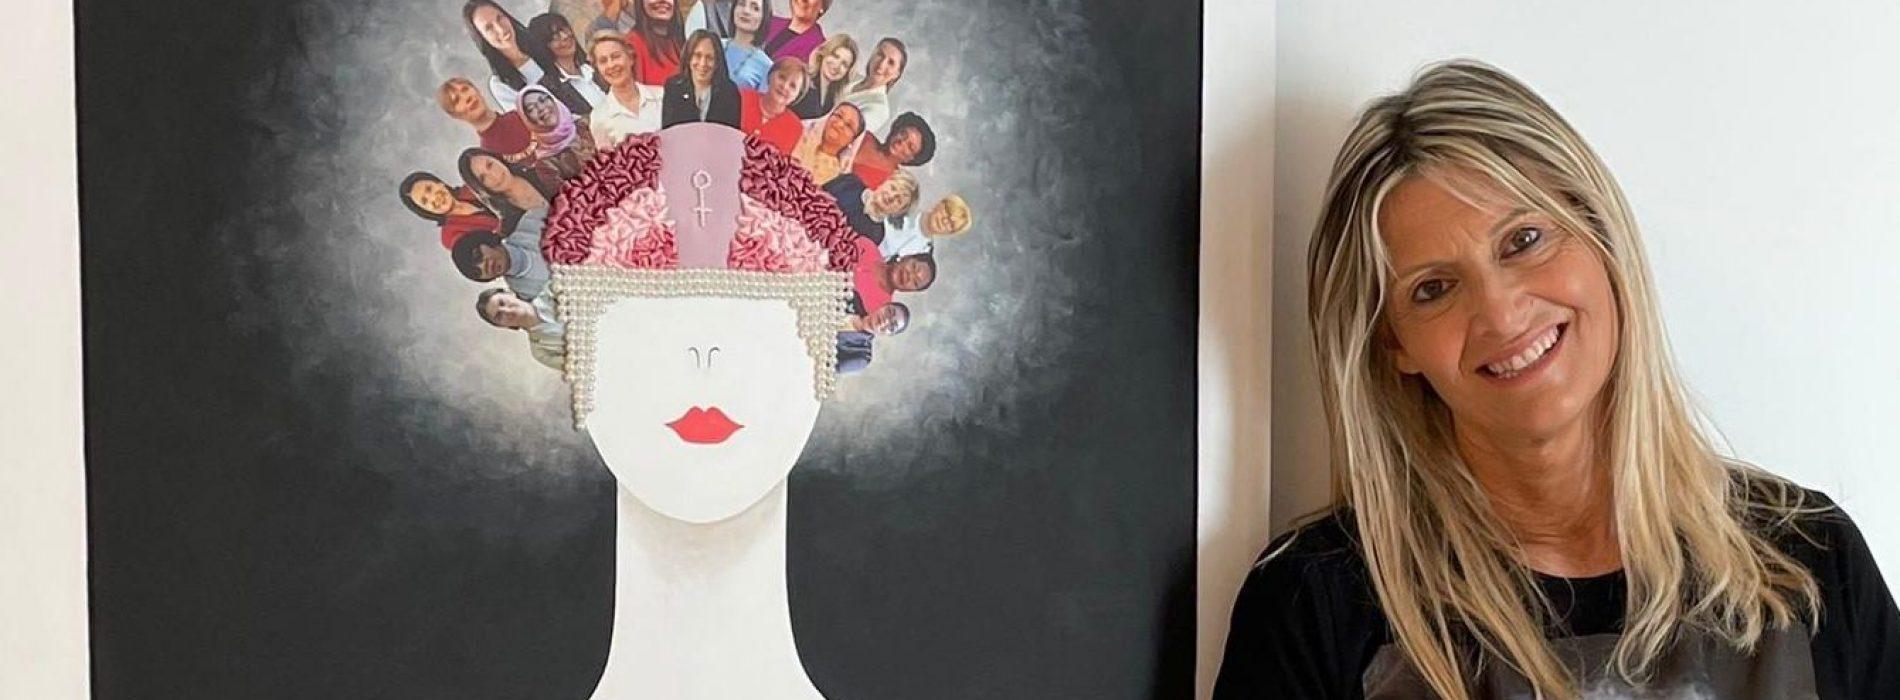 Claudia Mazzitelli da Artime, l'artista presenta le sue women